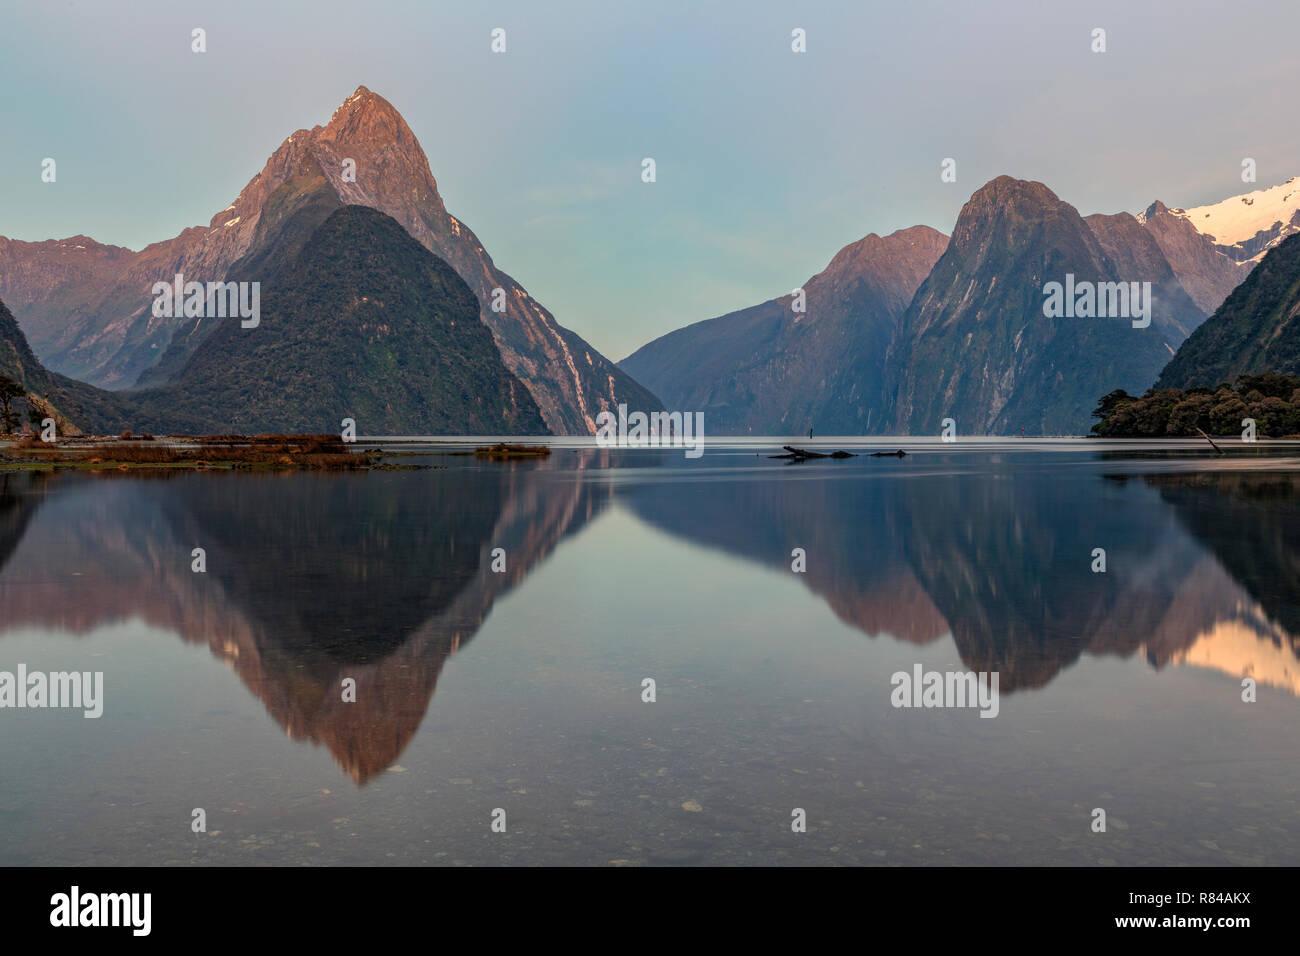 Milford Sound, South Island, Fiordland, New Zealand - Stock Image